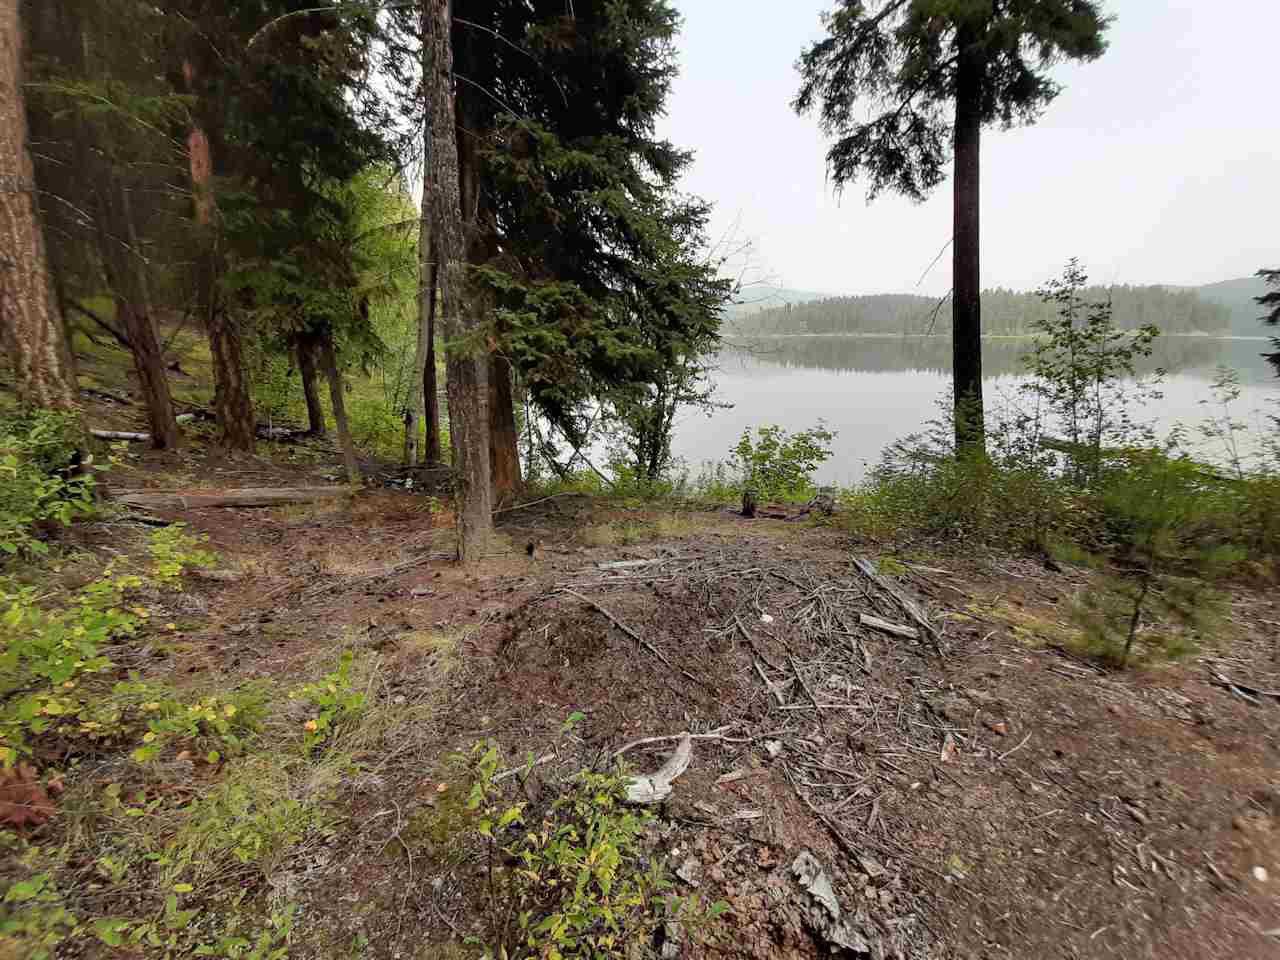 Main Photo: BLOCK C TIMOTHY Lake: Lac la Hache Land for sale (100 Mile House (Zone 10))  : MLS®# R2526423